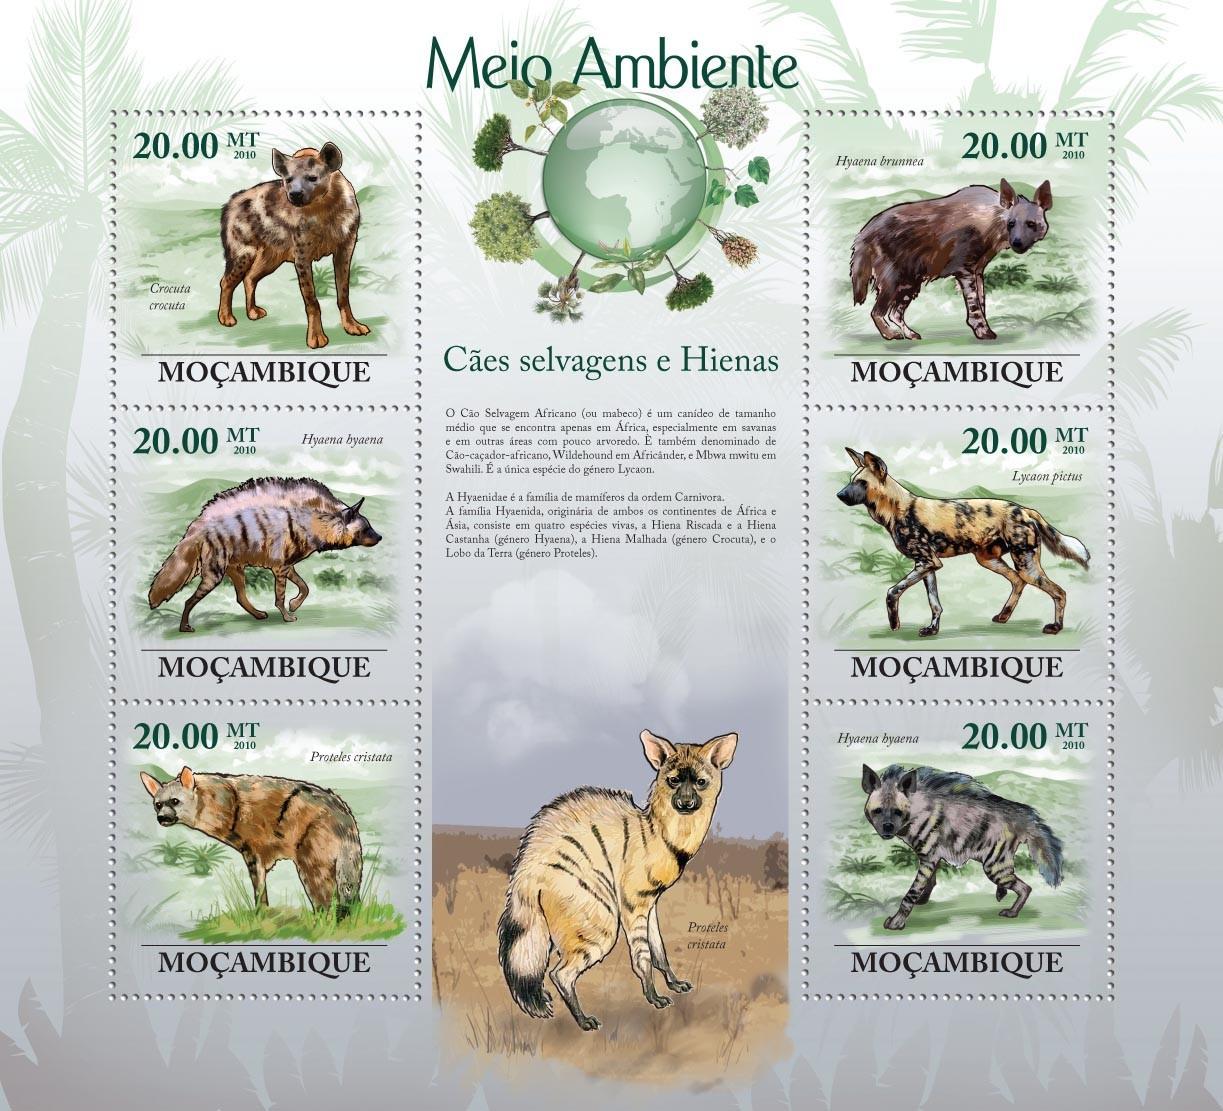 Wild Dogs & Hyenas,  ( Crocuta crocuta, Hyaena byaena, Lycaon pictus, Proteles cristata, etc..) - Issue of Mozambique postage Stamps